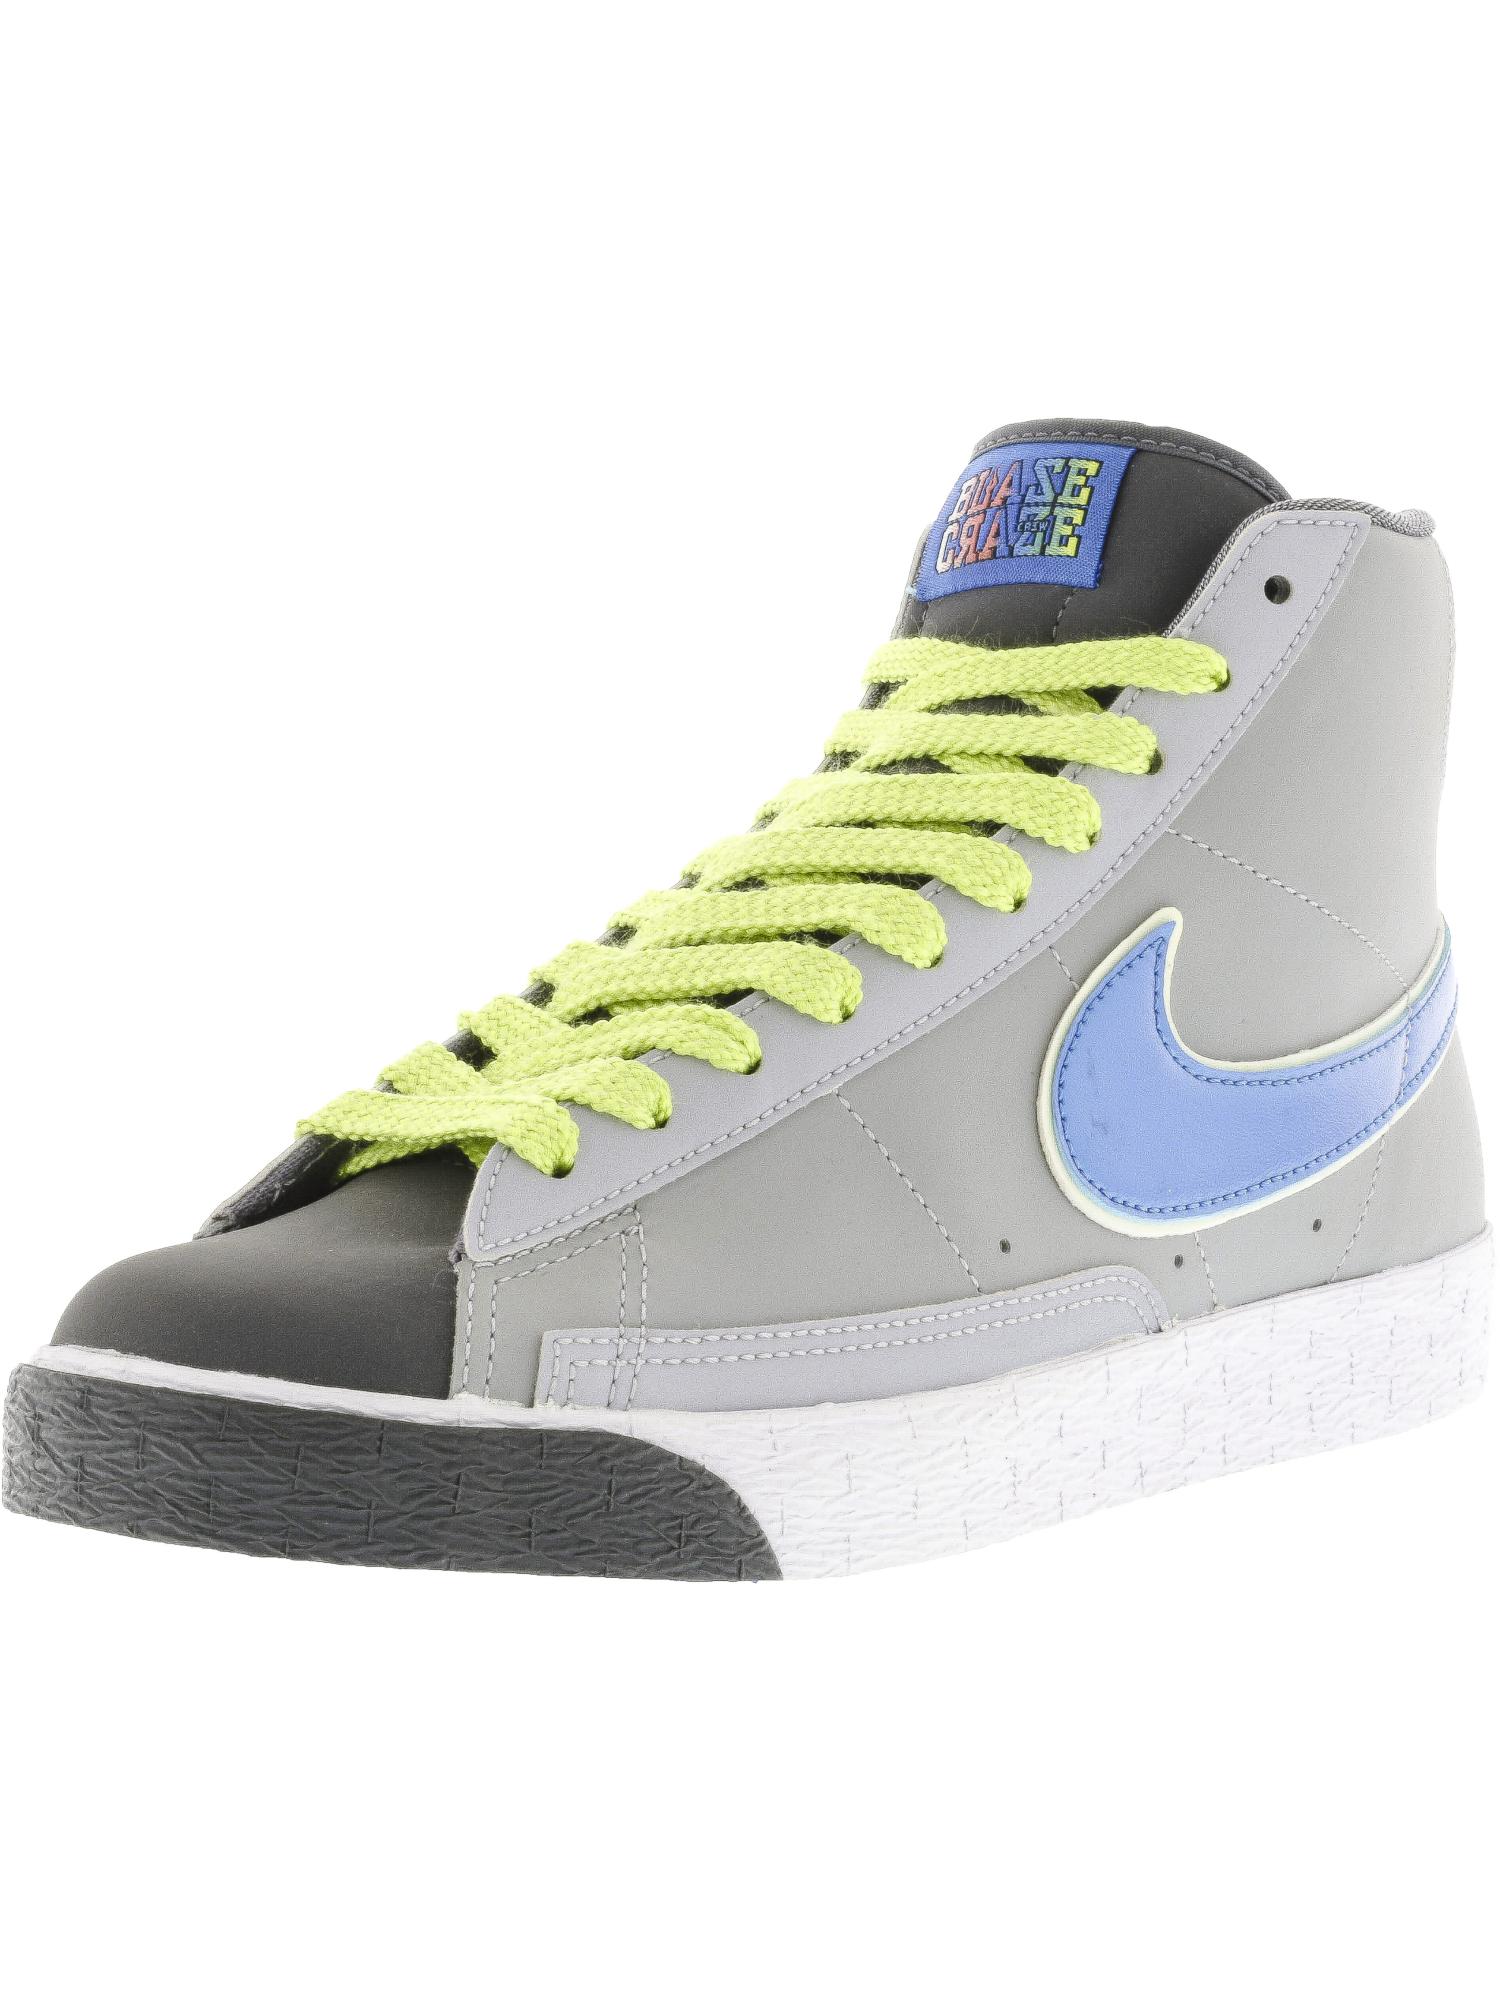 nike air max thea women's running shoes blacksummit white sku:99409020